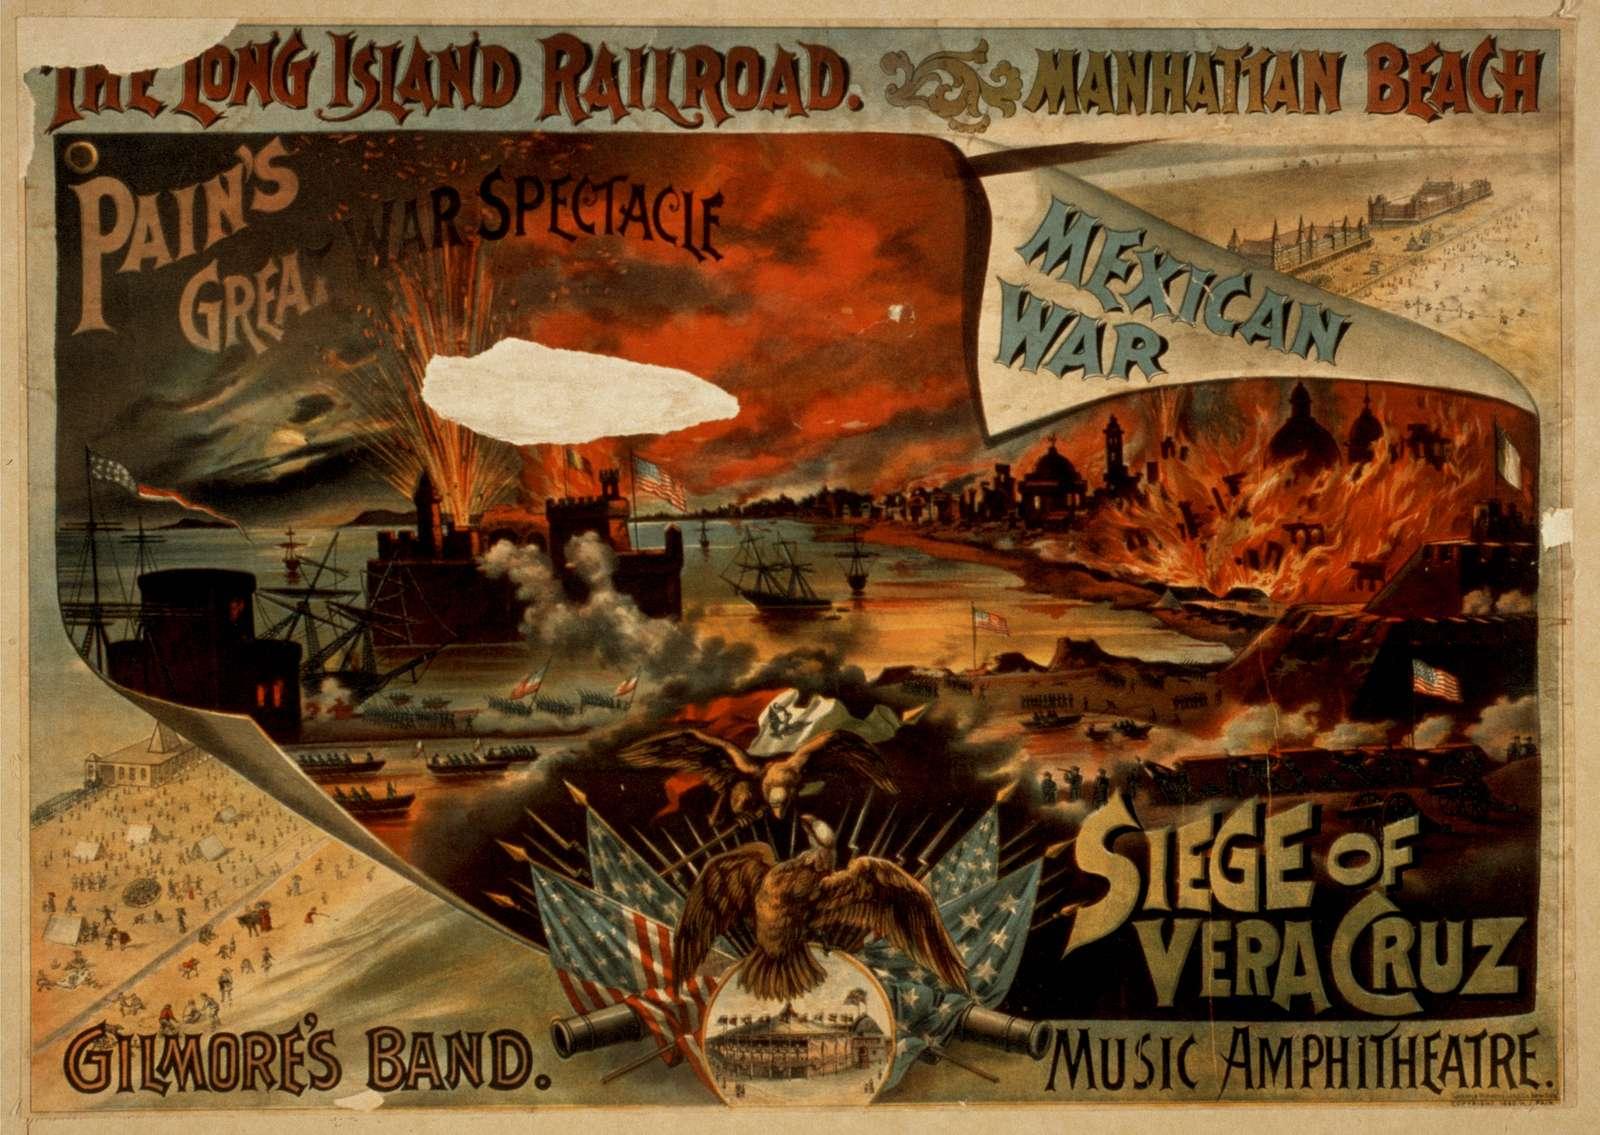 Pain's great war spectacle, Mexican War, Siege of Vera Cruz